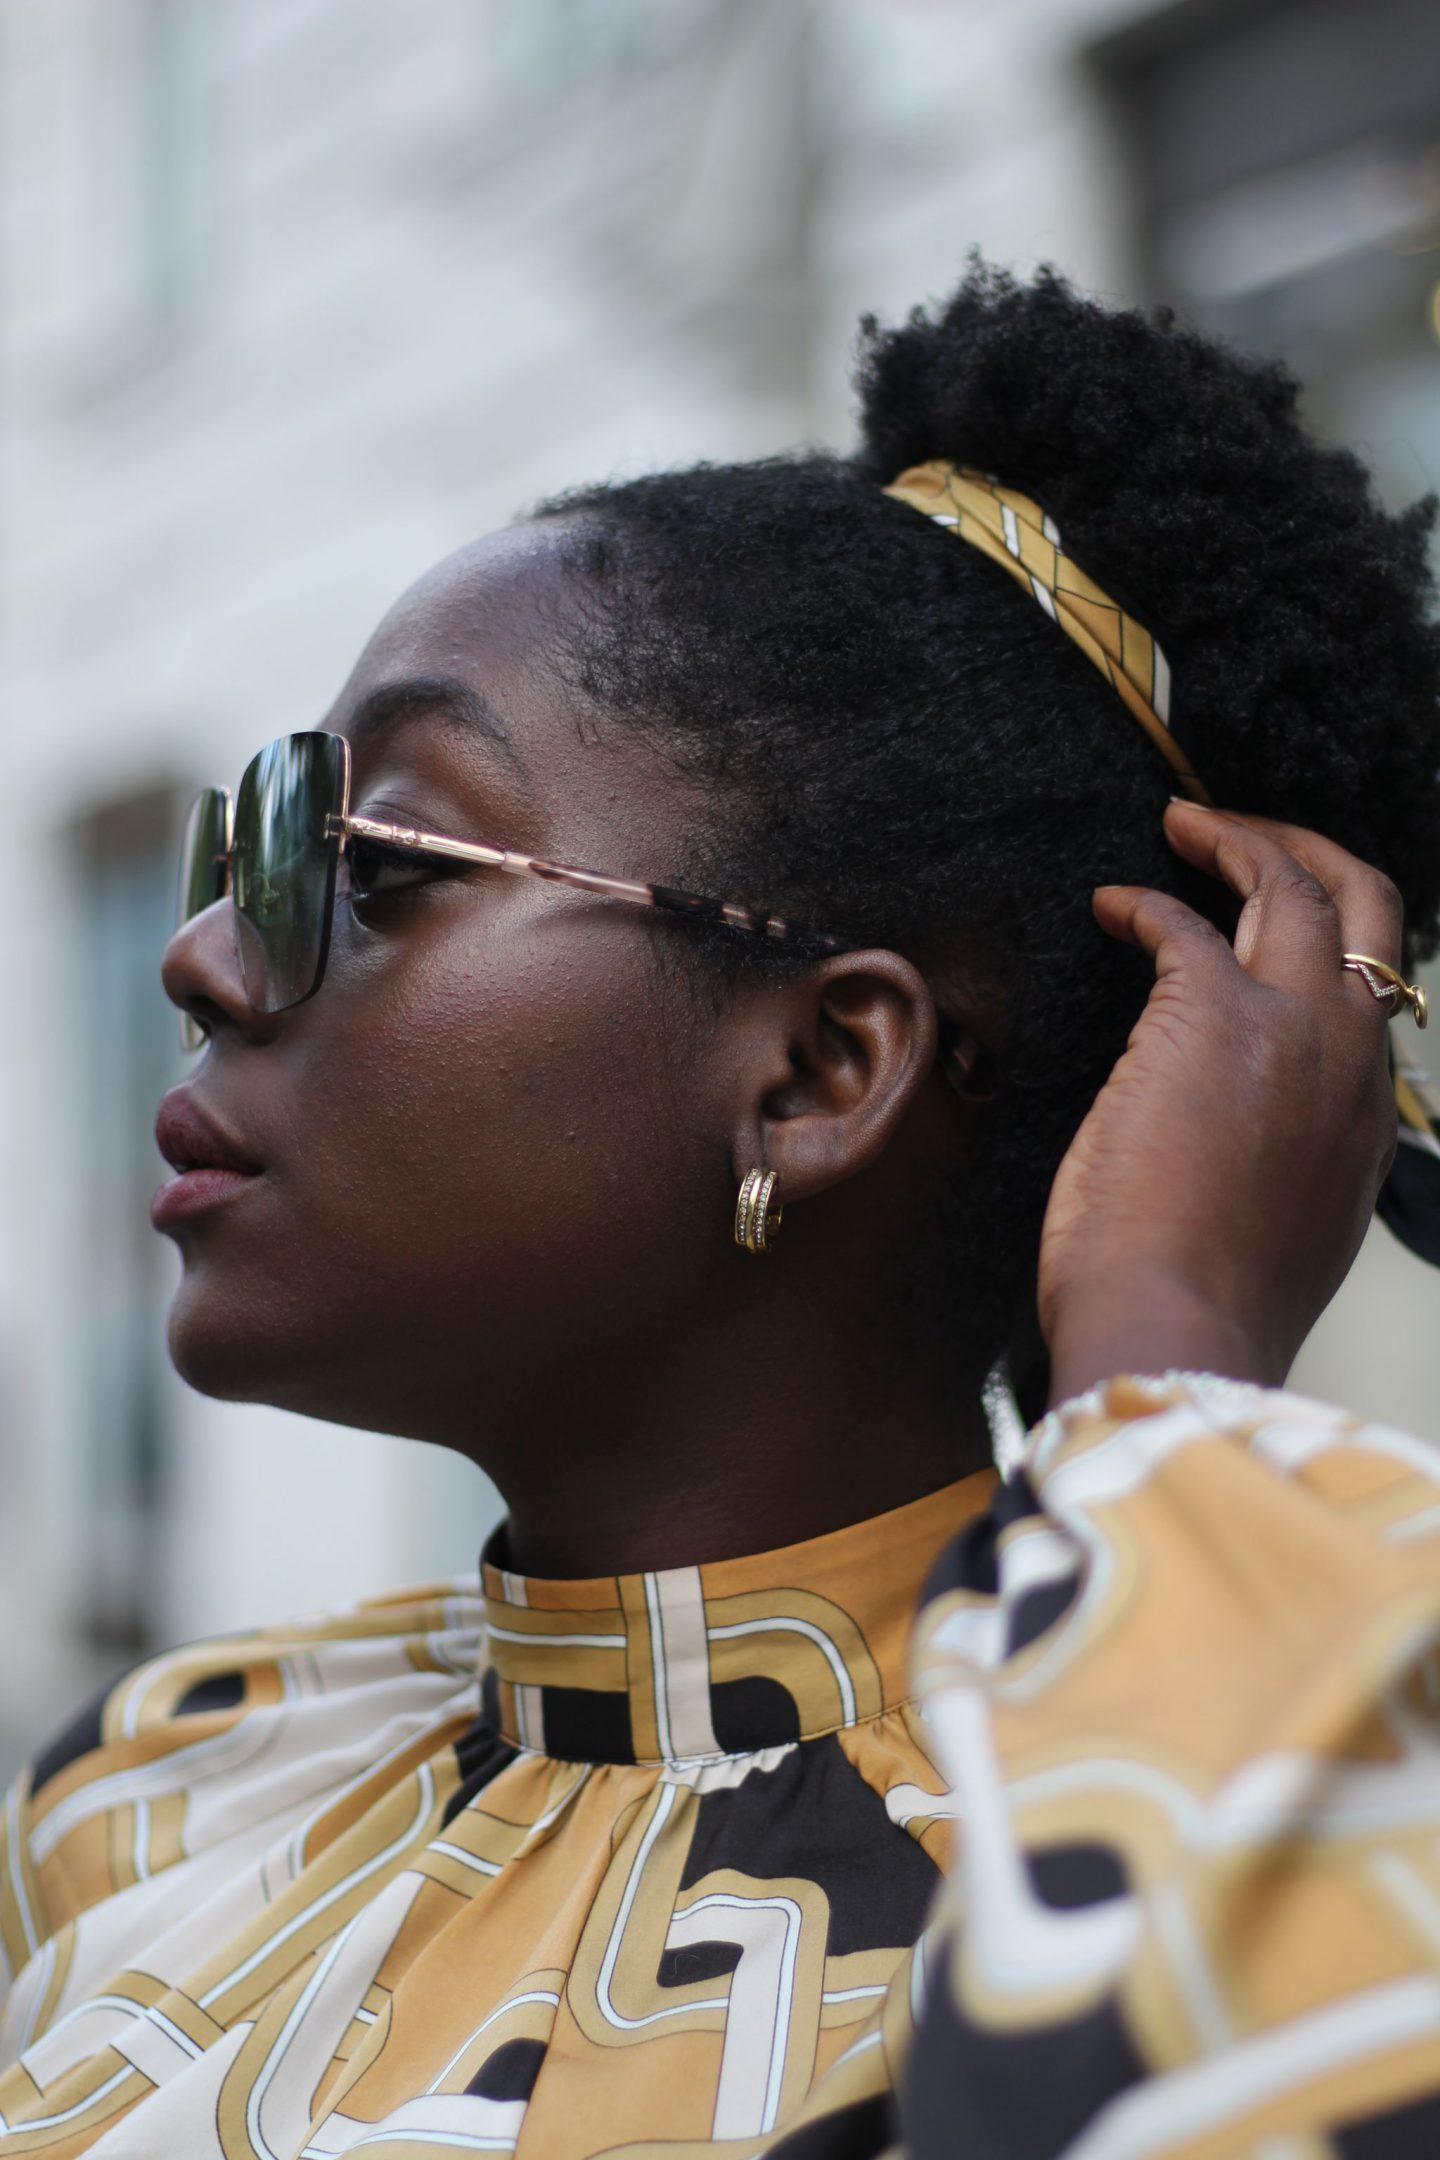 afro_hair_styles_natural_hair_Richard_Allan_HM_Lois_Opoku_streetstyle_lisforlois_3